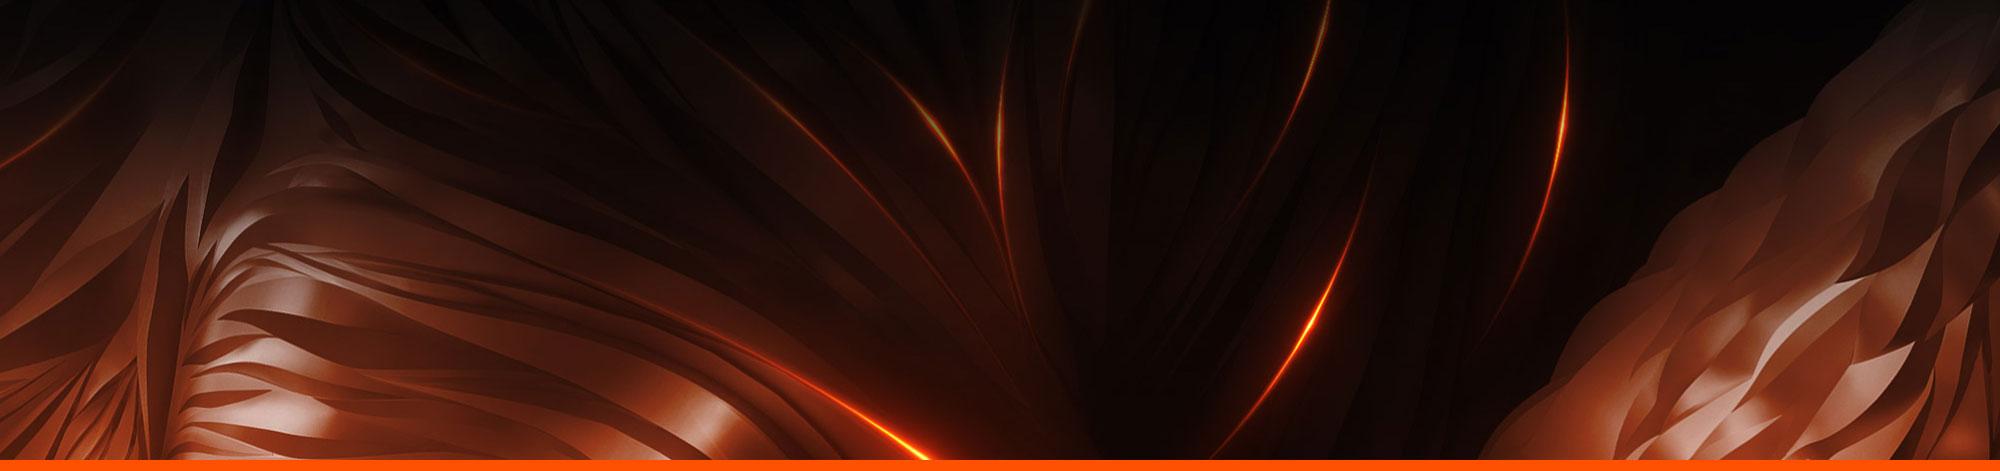 FireCuda background